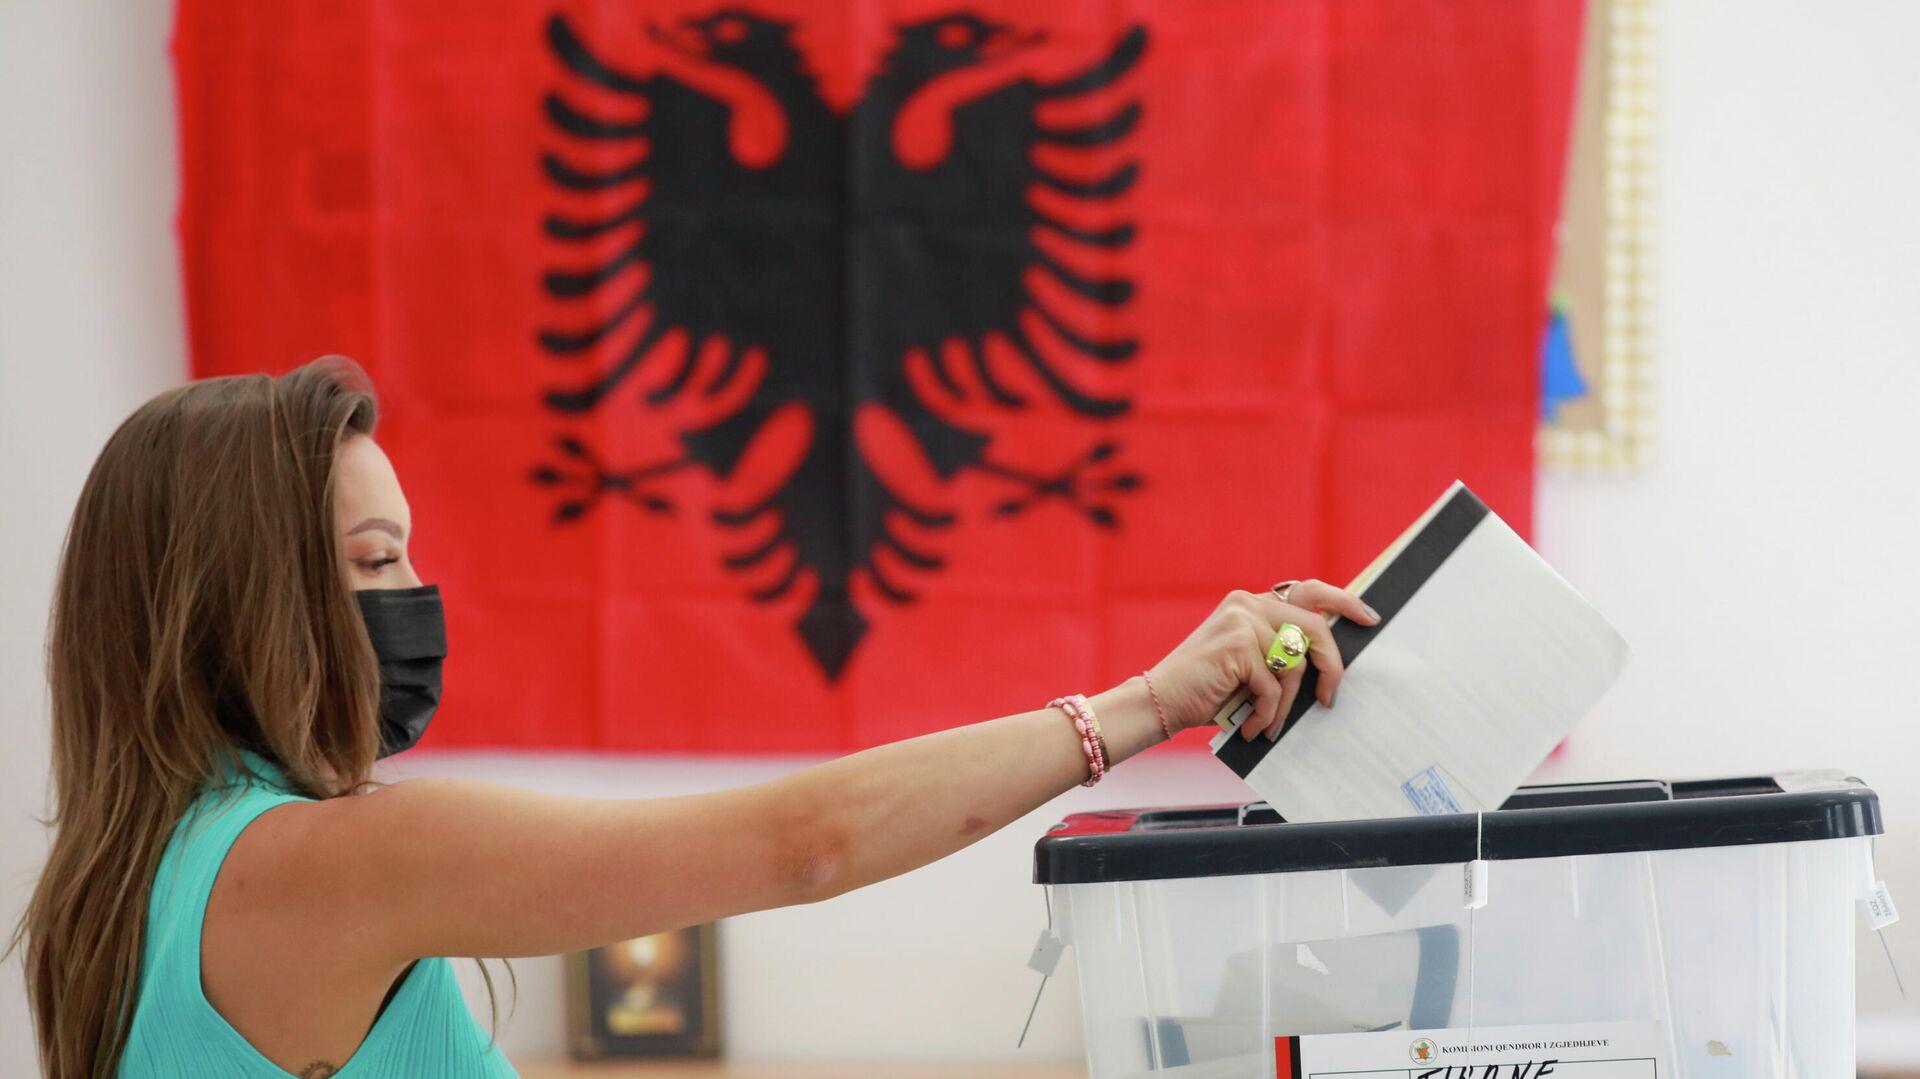 Elecciones en Albania  - Sputnik Mundo, 1920, 28.04.2021